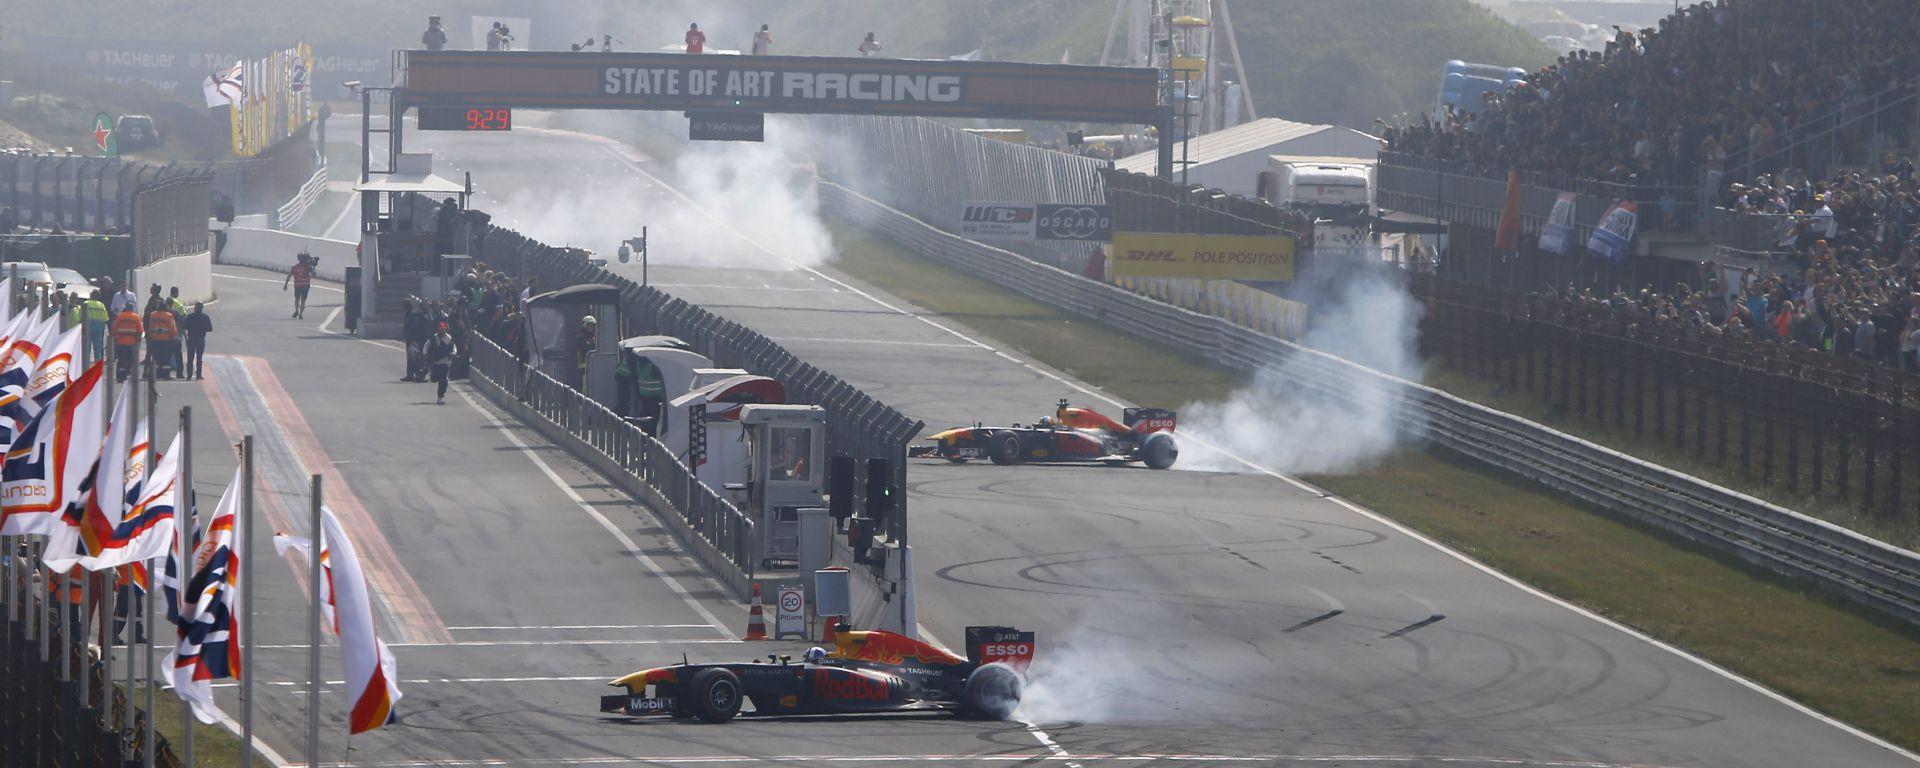 Ufficiale: nel 2020 torna il GP d'Olanda di F1 a Zandvoort